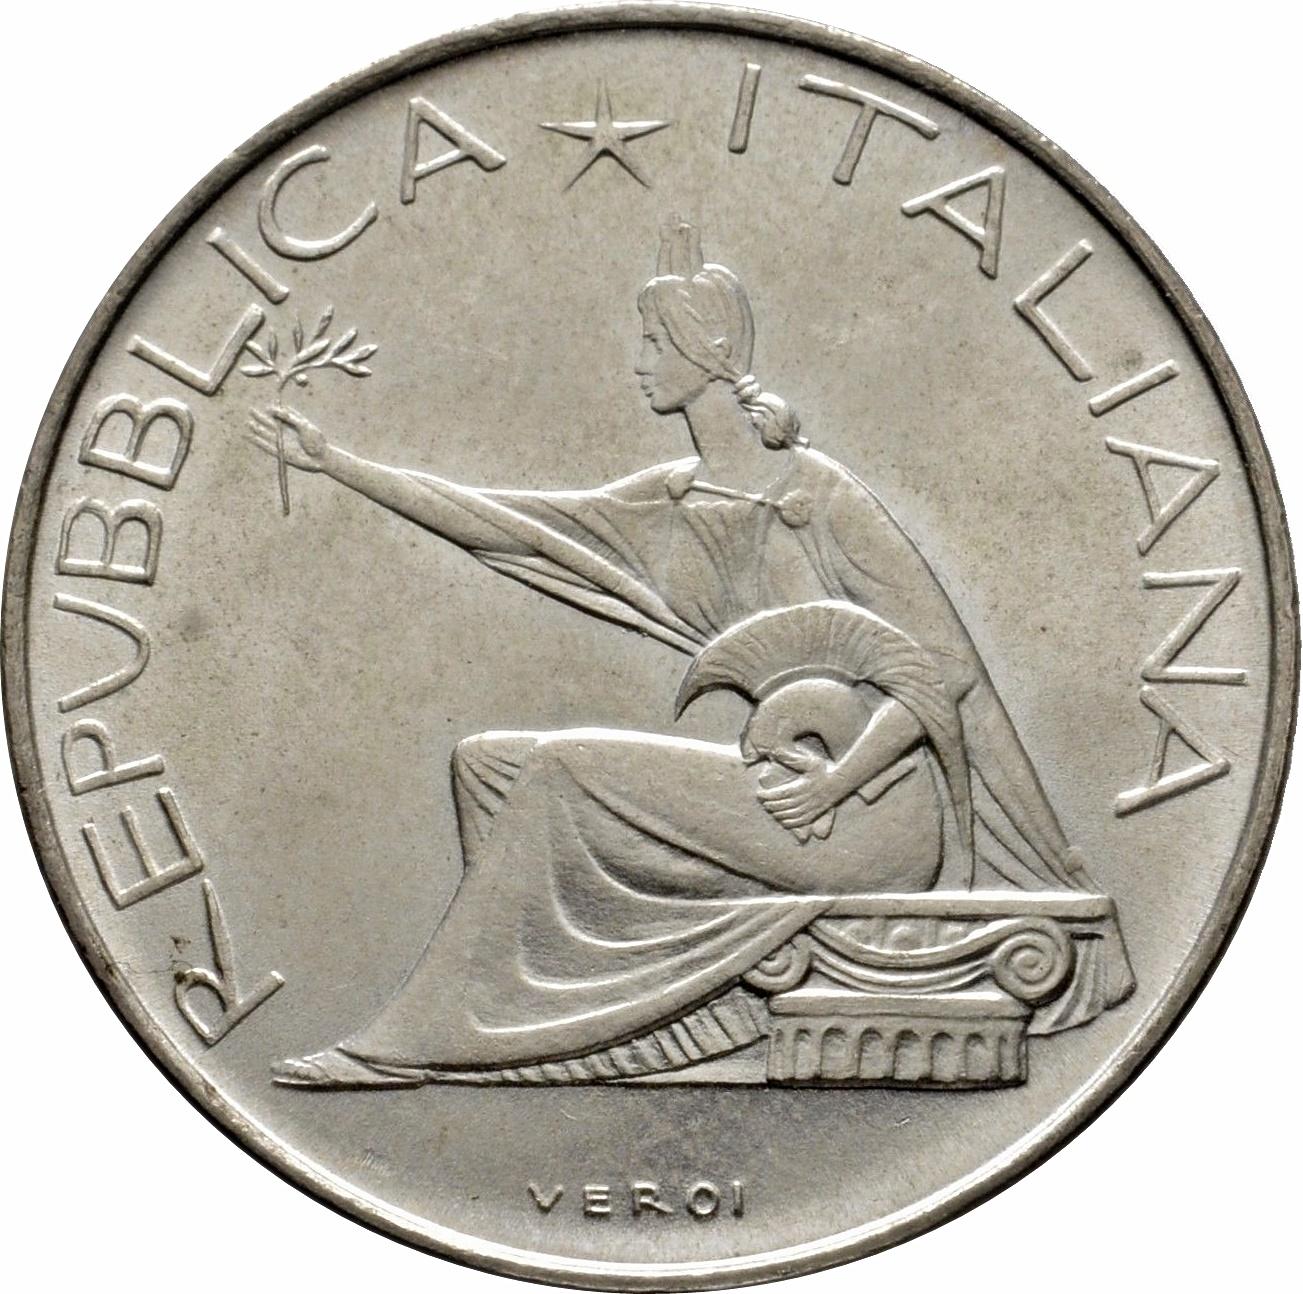 500 Lire Unification Centennial Italy Numista